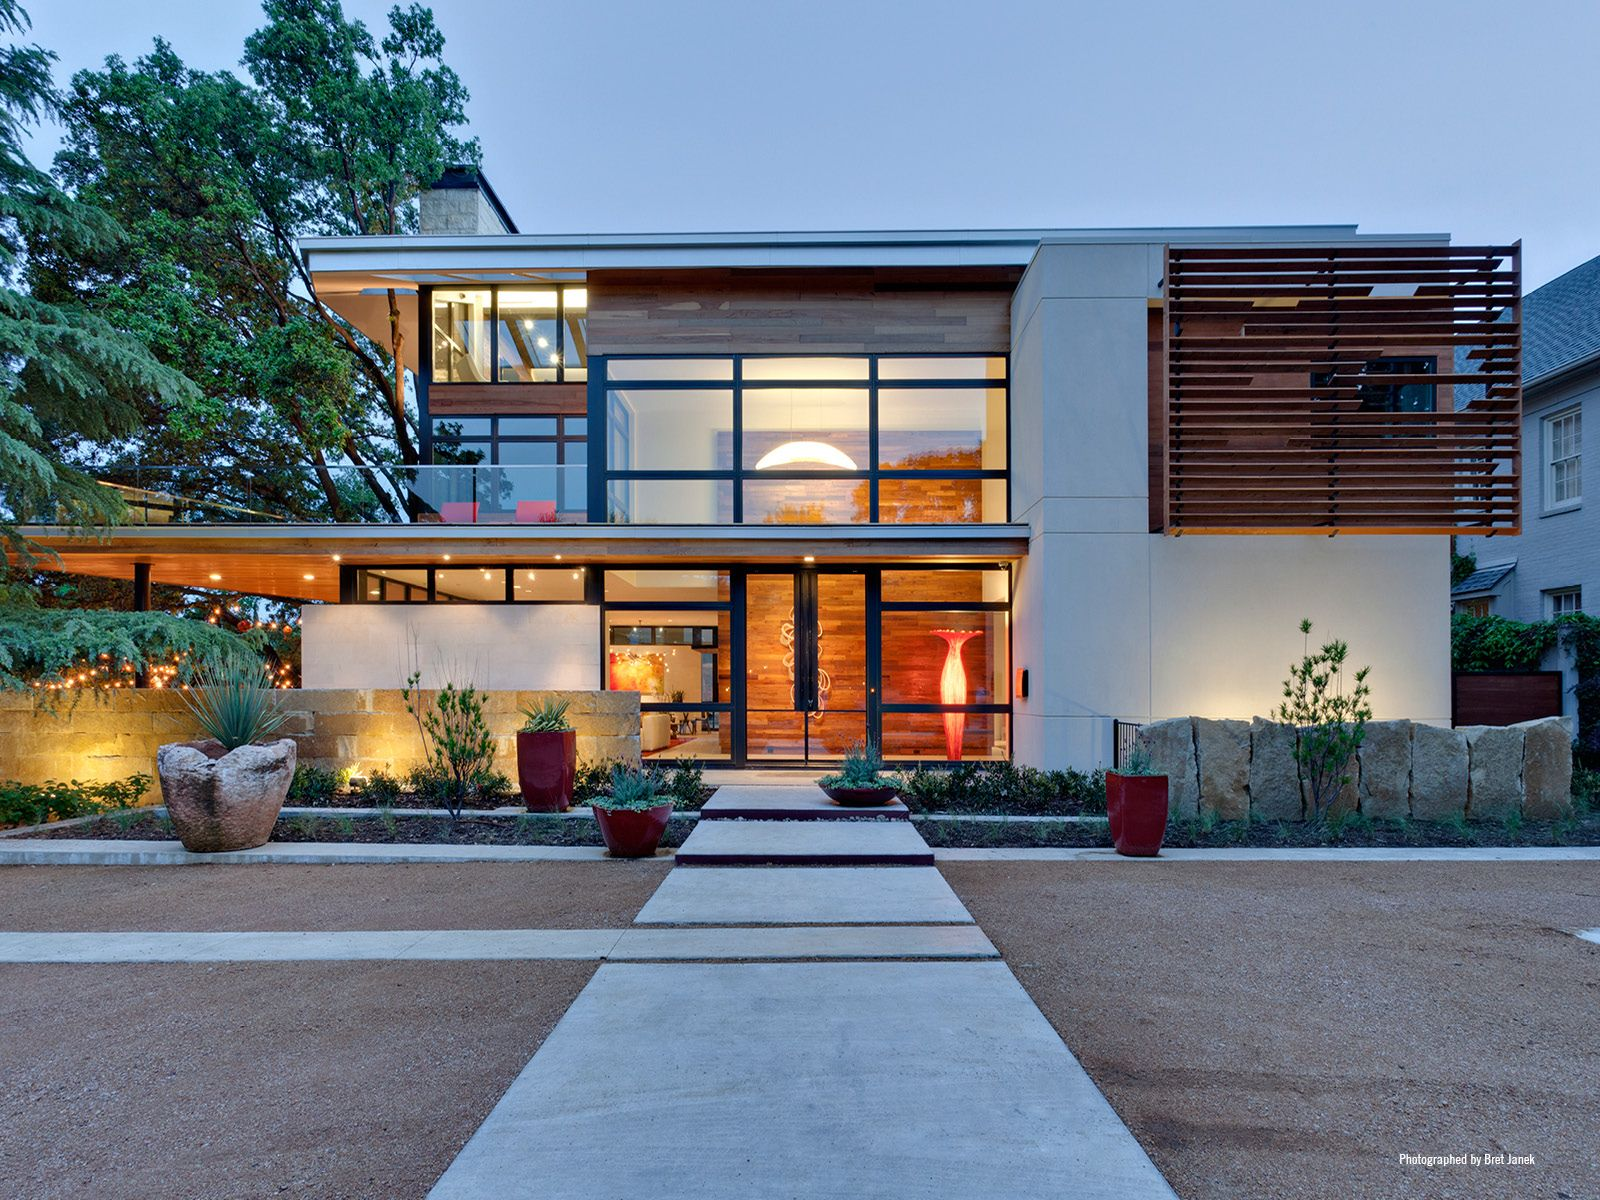 Caruth Boulevard Residence By Tom Reisenbichler Amazing